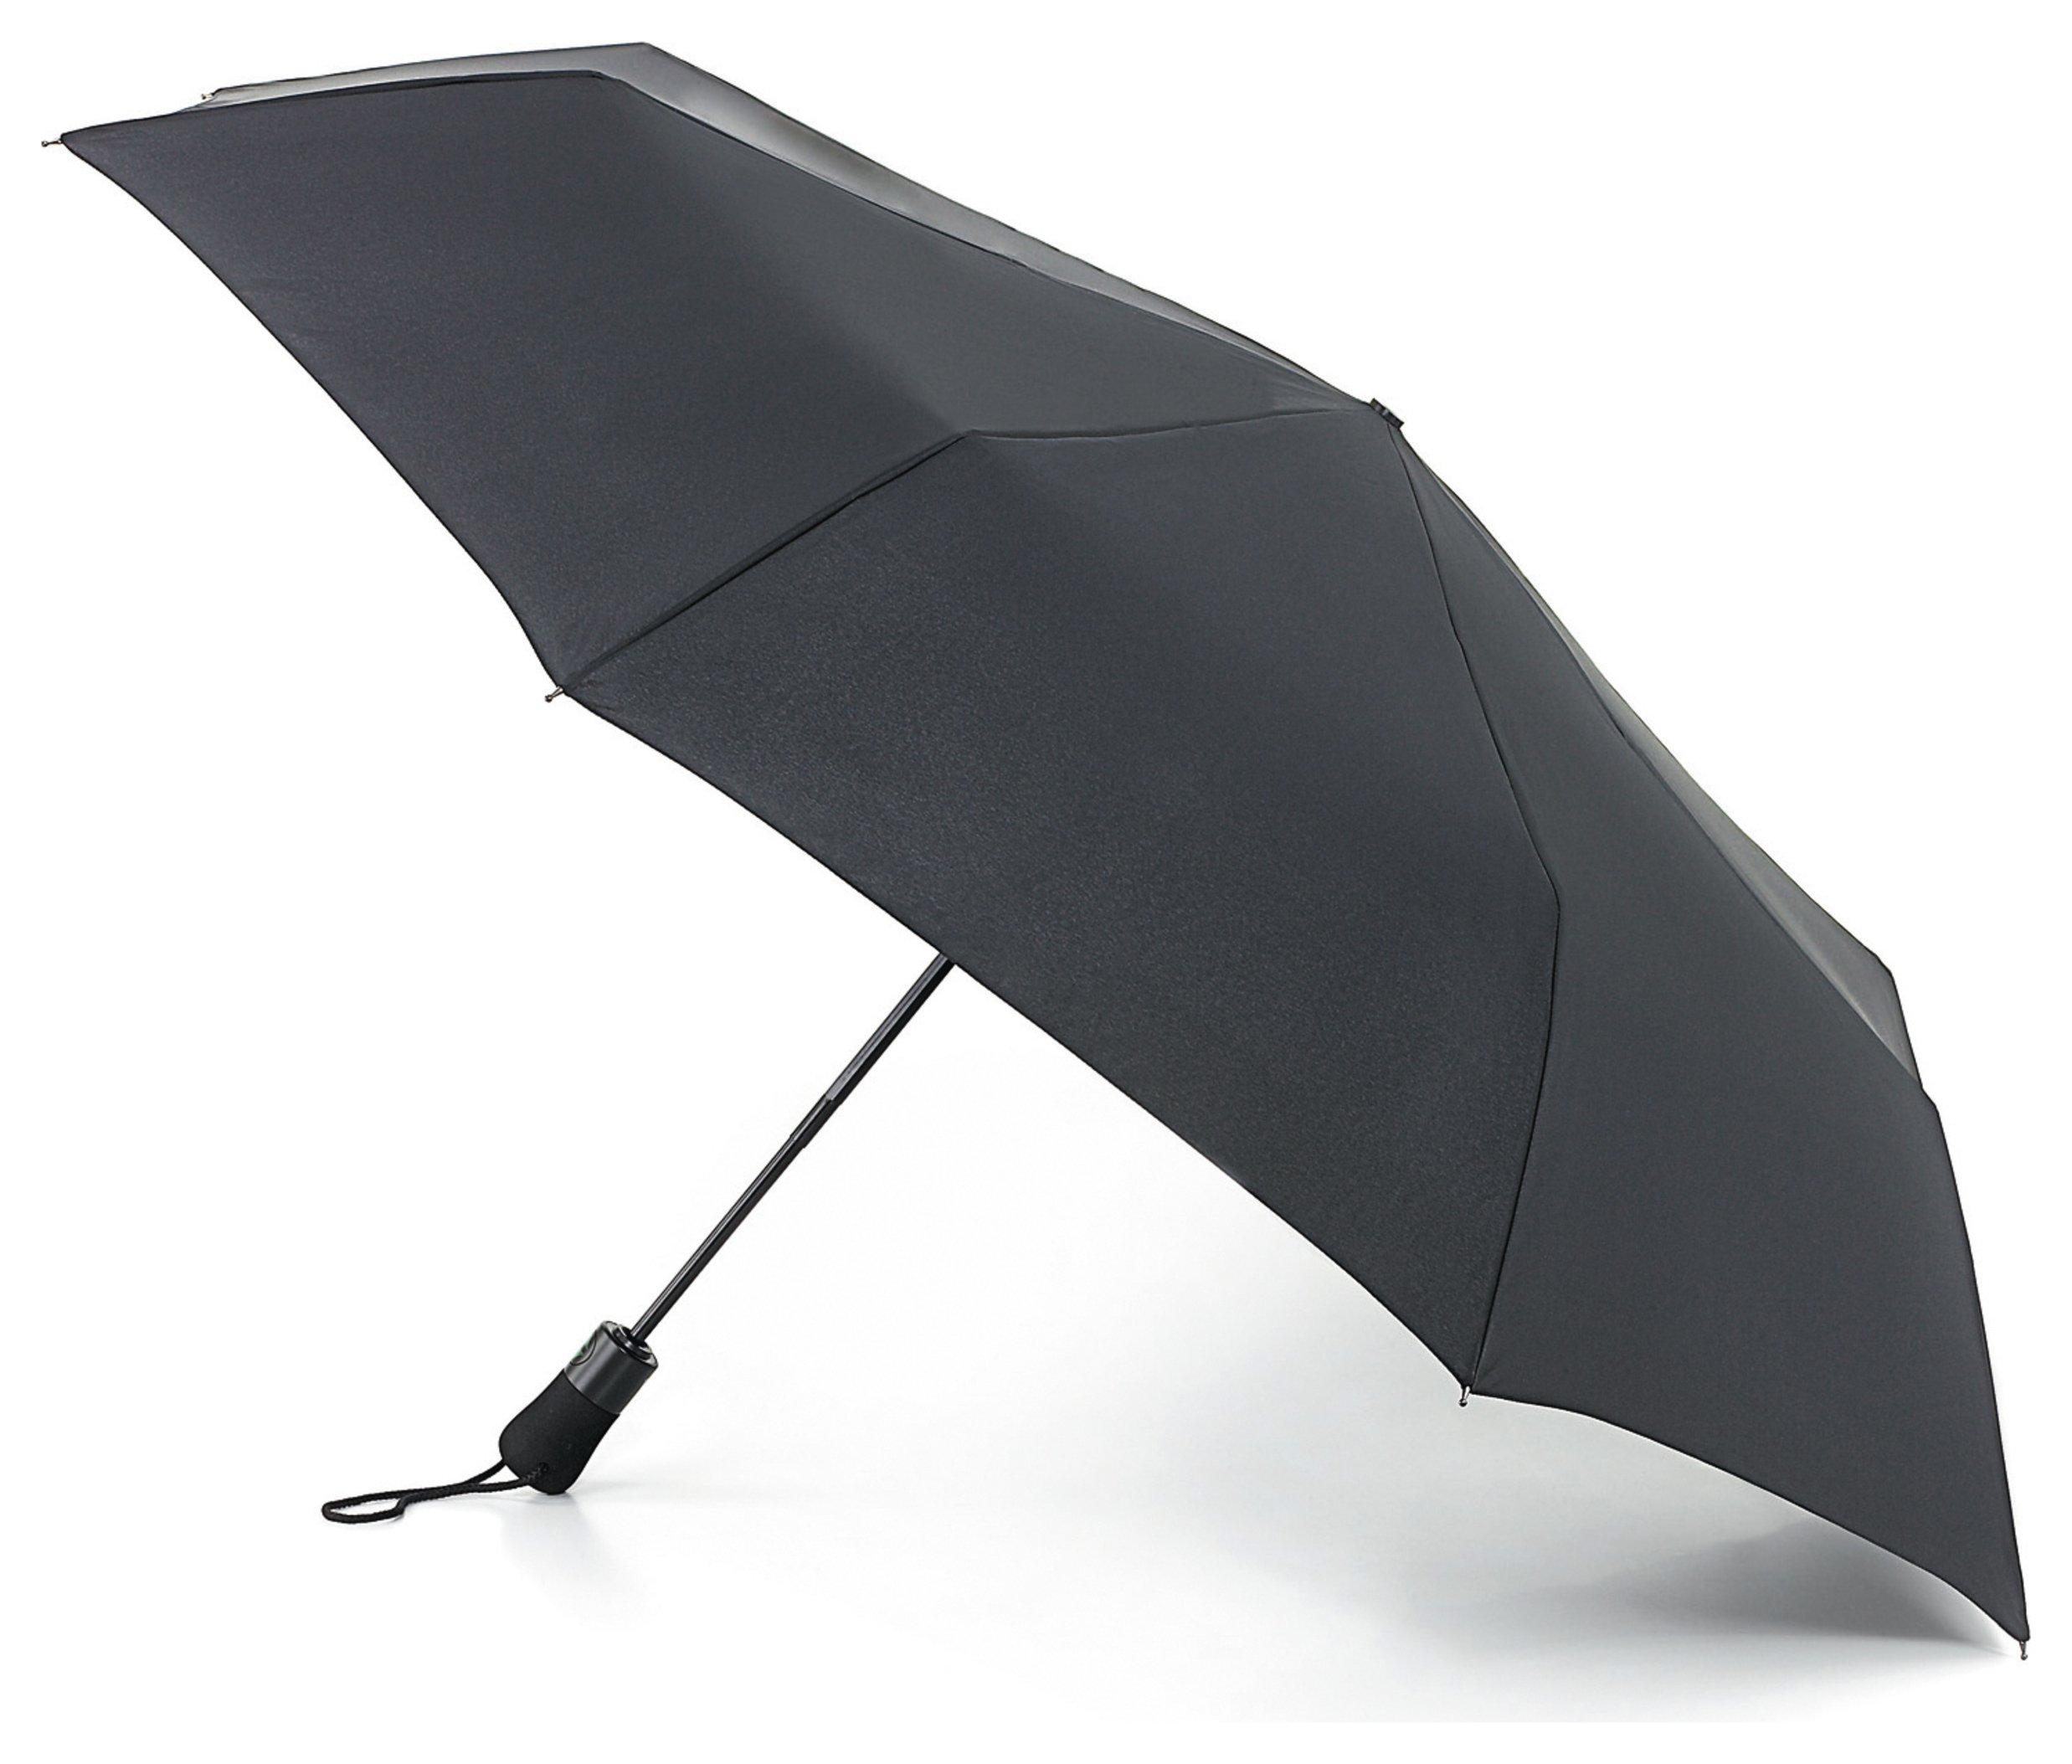 Fulton Open & Close Jumbo Umbrella - Black